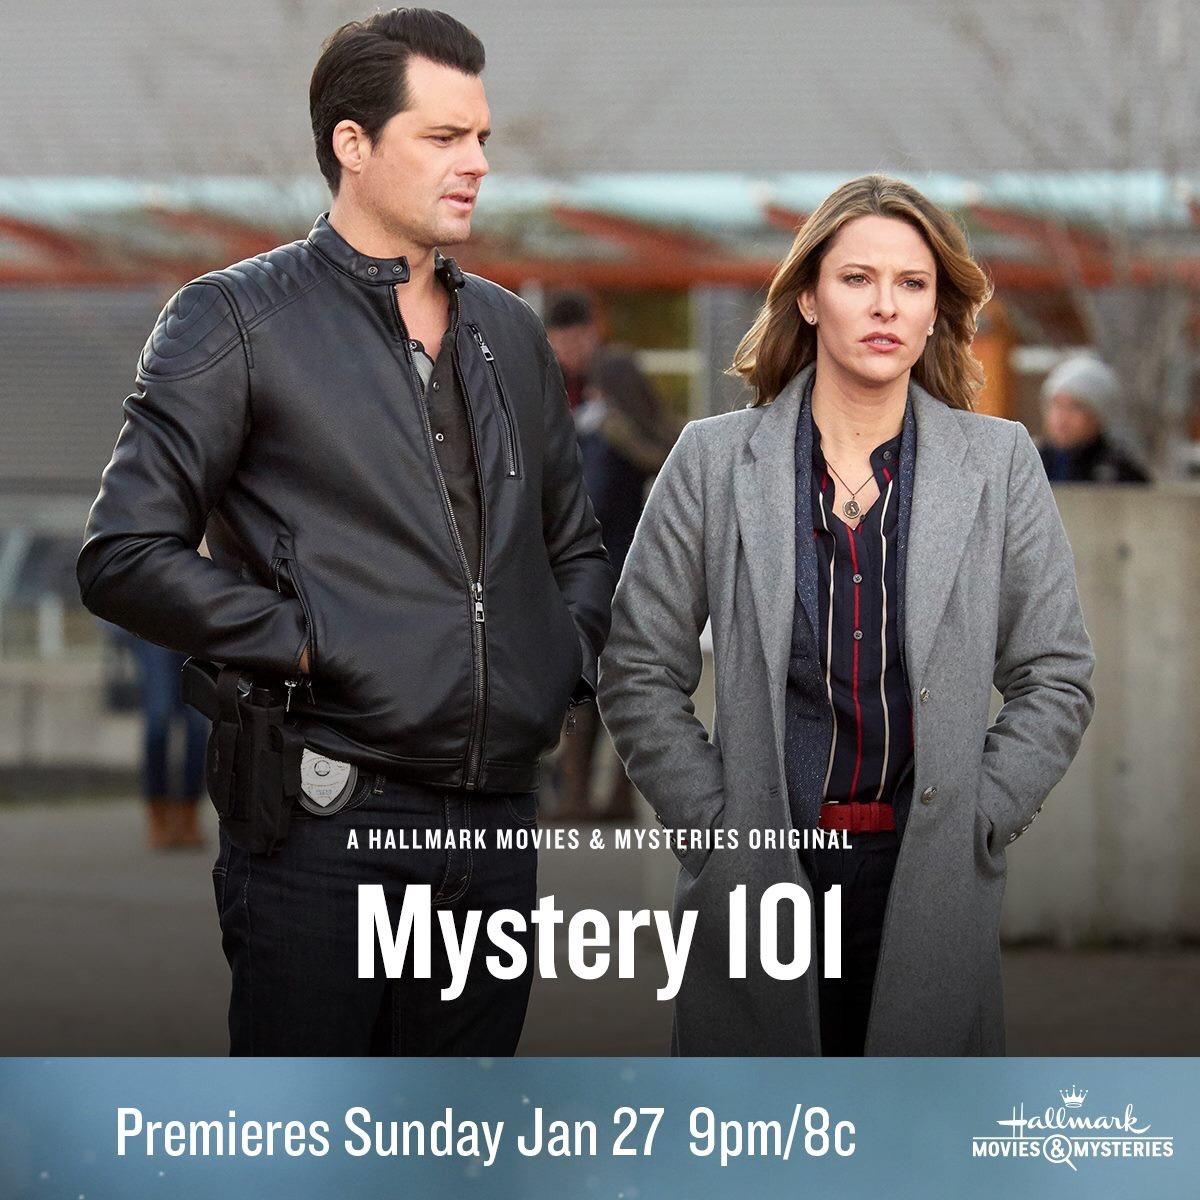 New Hallmark Movies & Mysteries Movie Mystery 101: Review